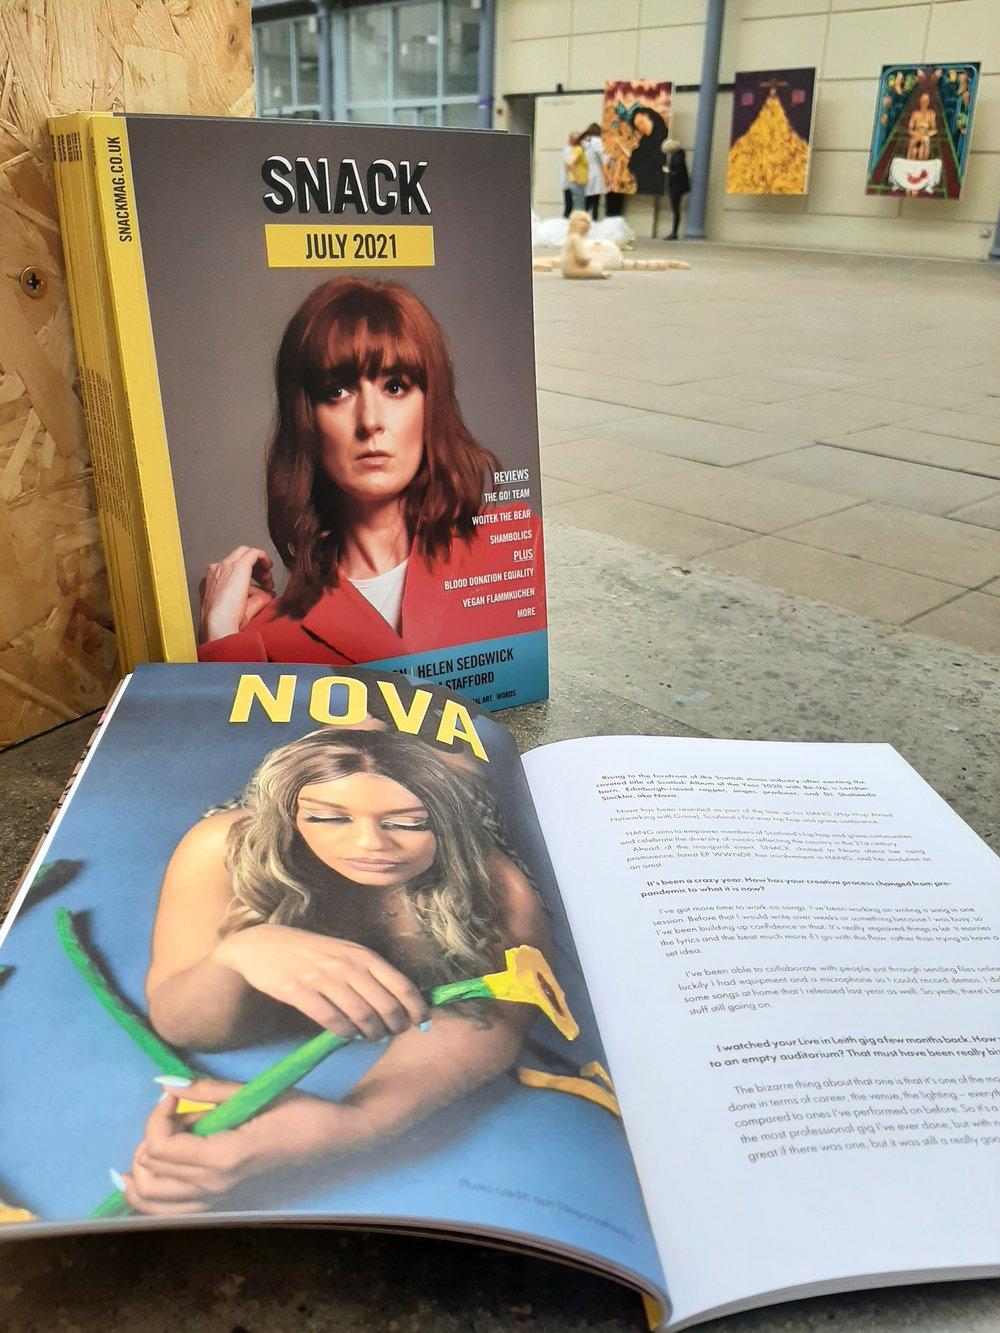 SNACK magazine: July 2021 – Issue 29